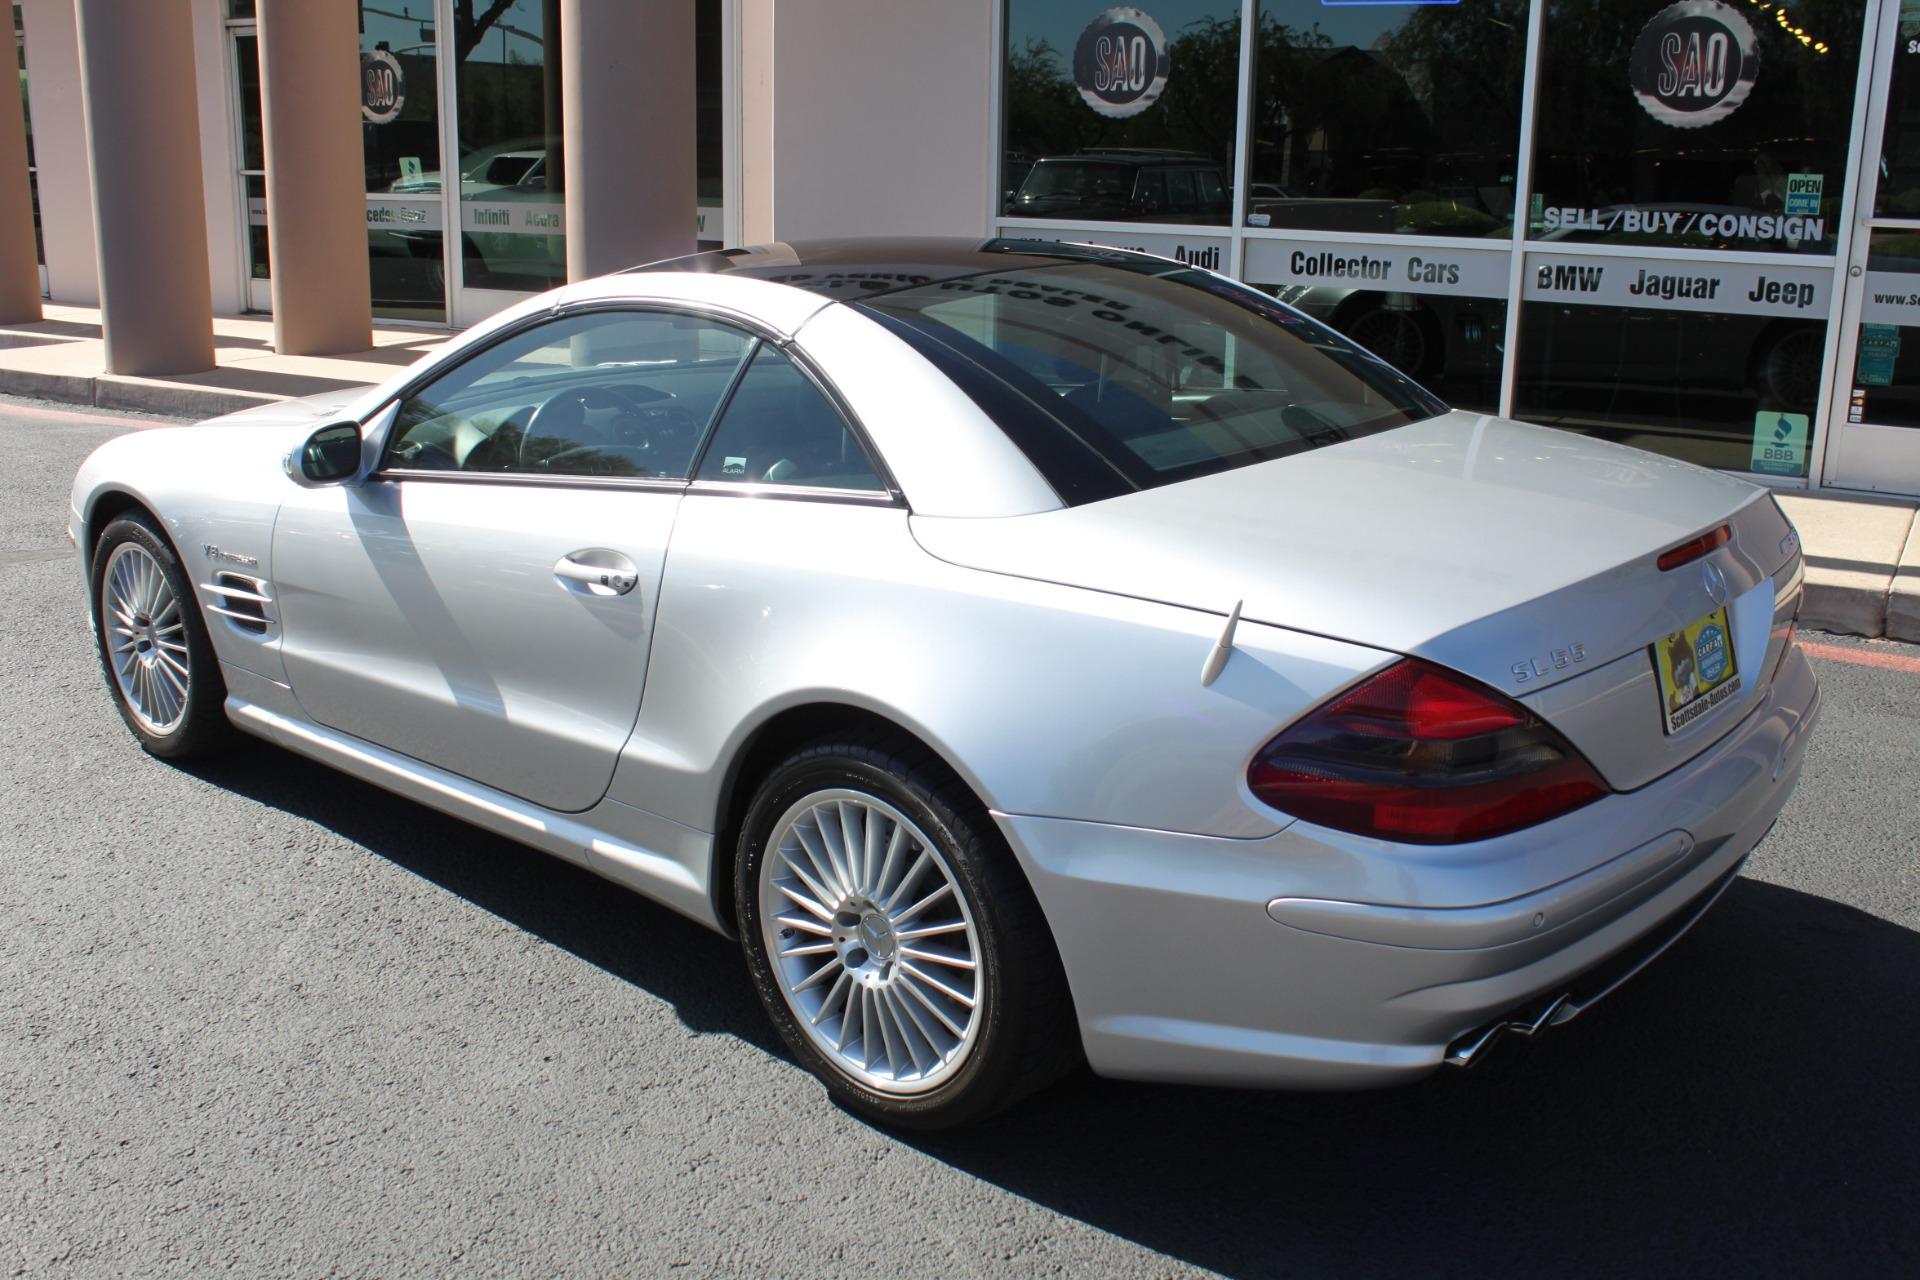 Used-2003-Mercedes-Benz-SL-Class-AMG-4X4